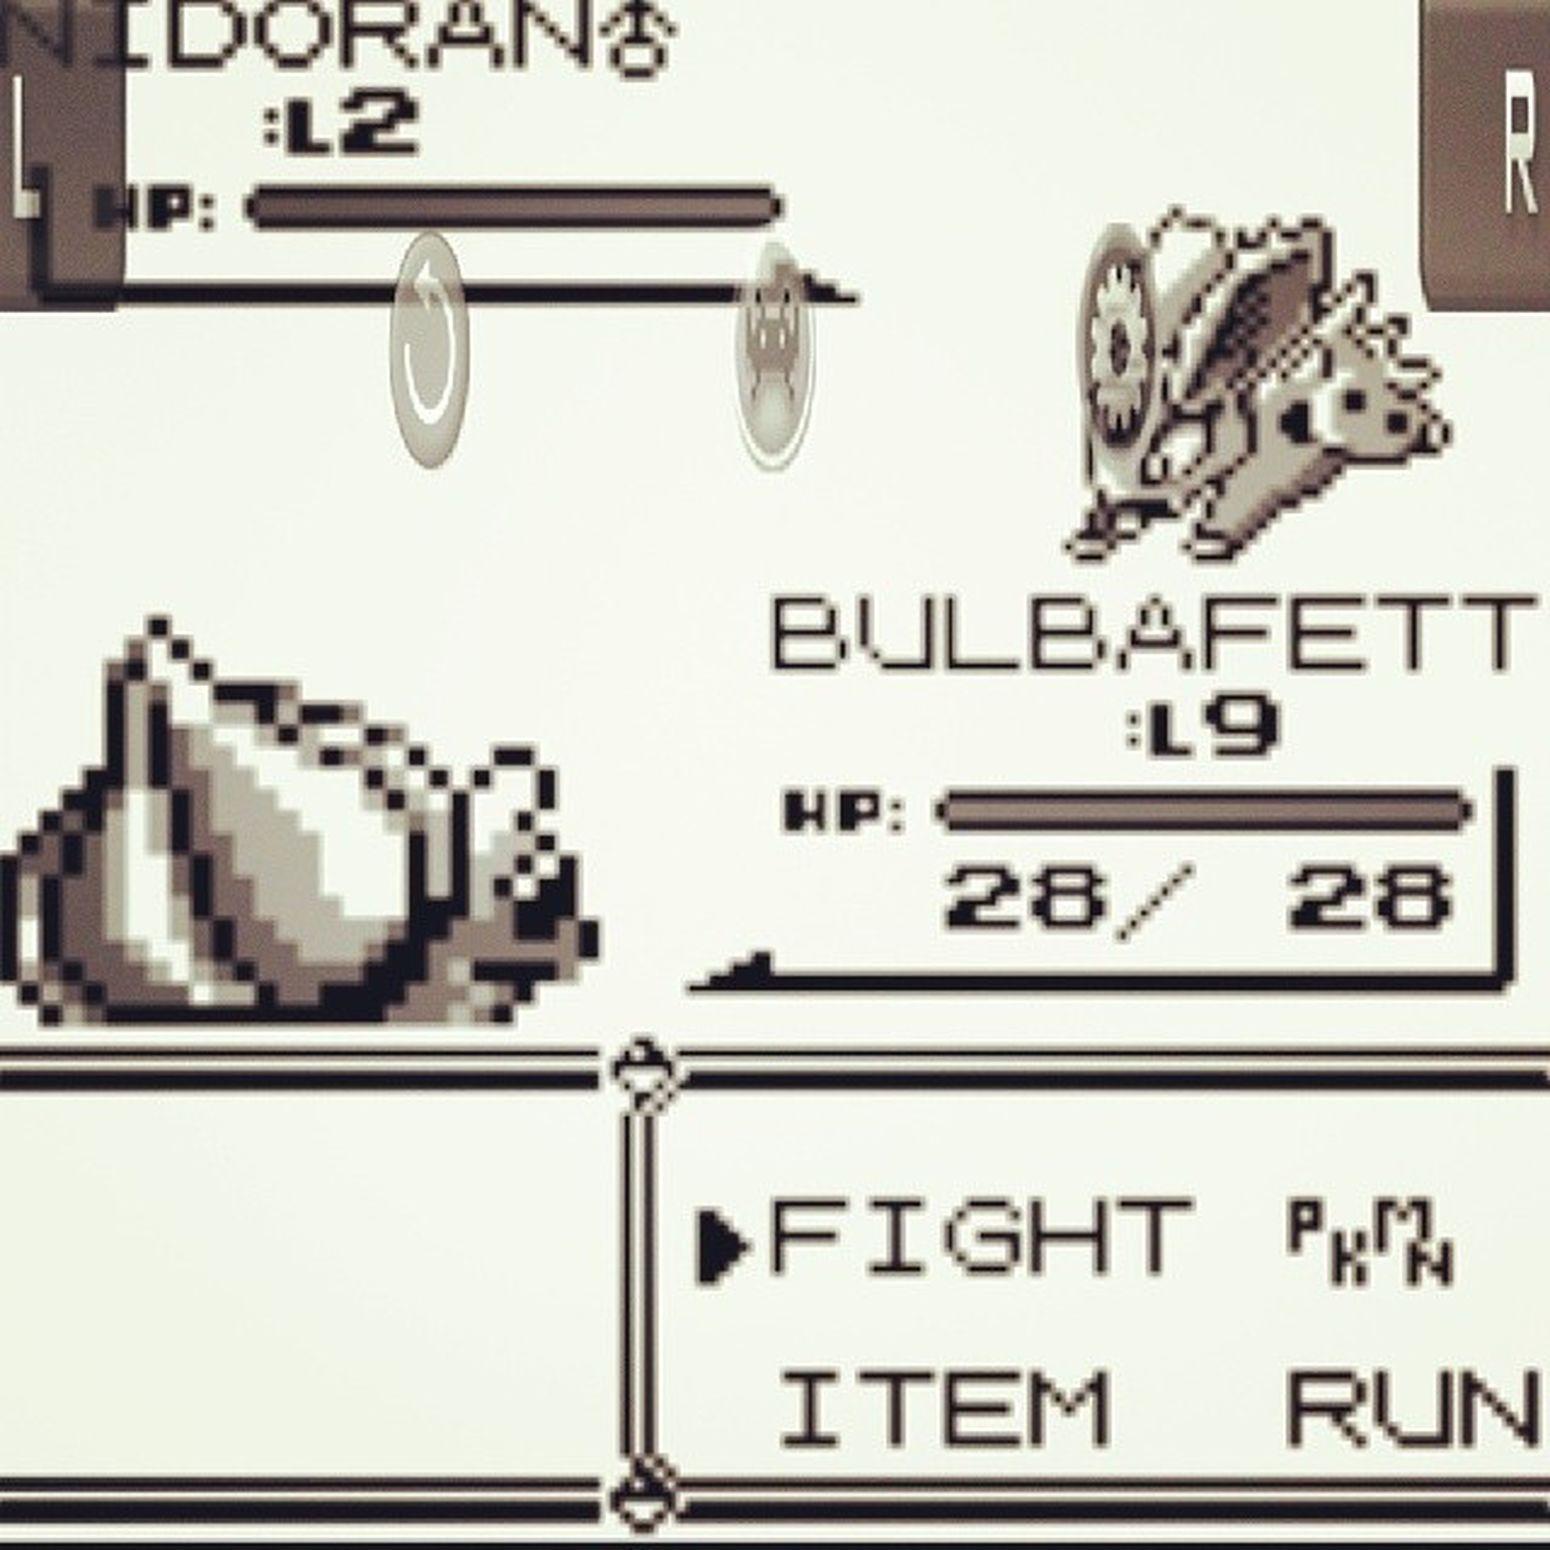 Gotta get the nerdcore on. Snagged my boy and girl Nidoran . Time to hit VeridianForest Oldschool Pokémon redversion bulbafett gottacatchemall